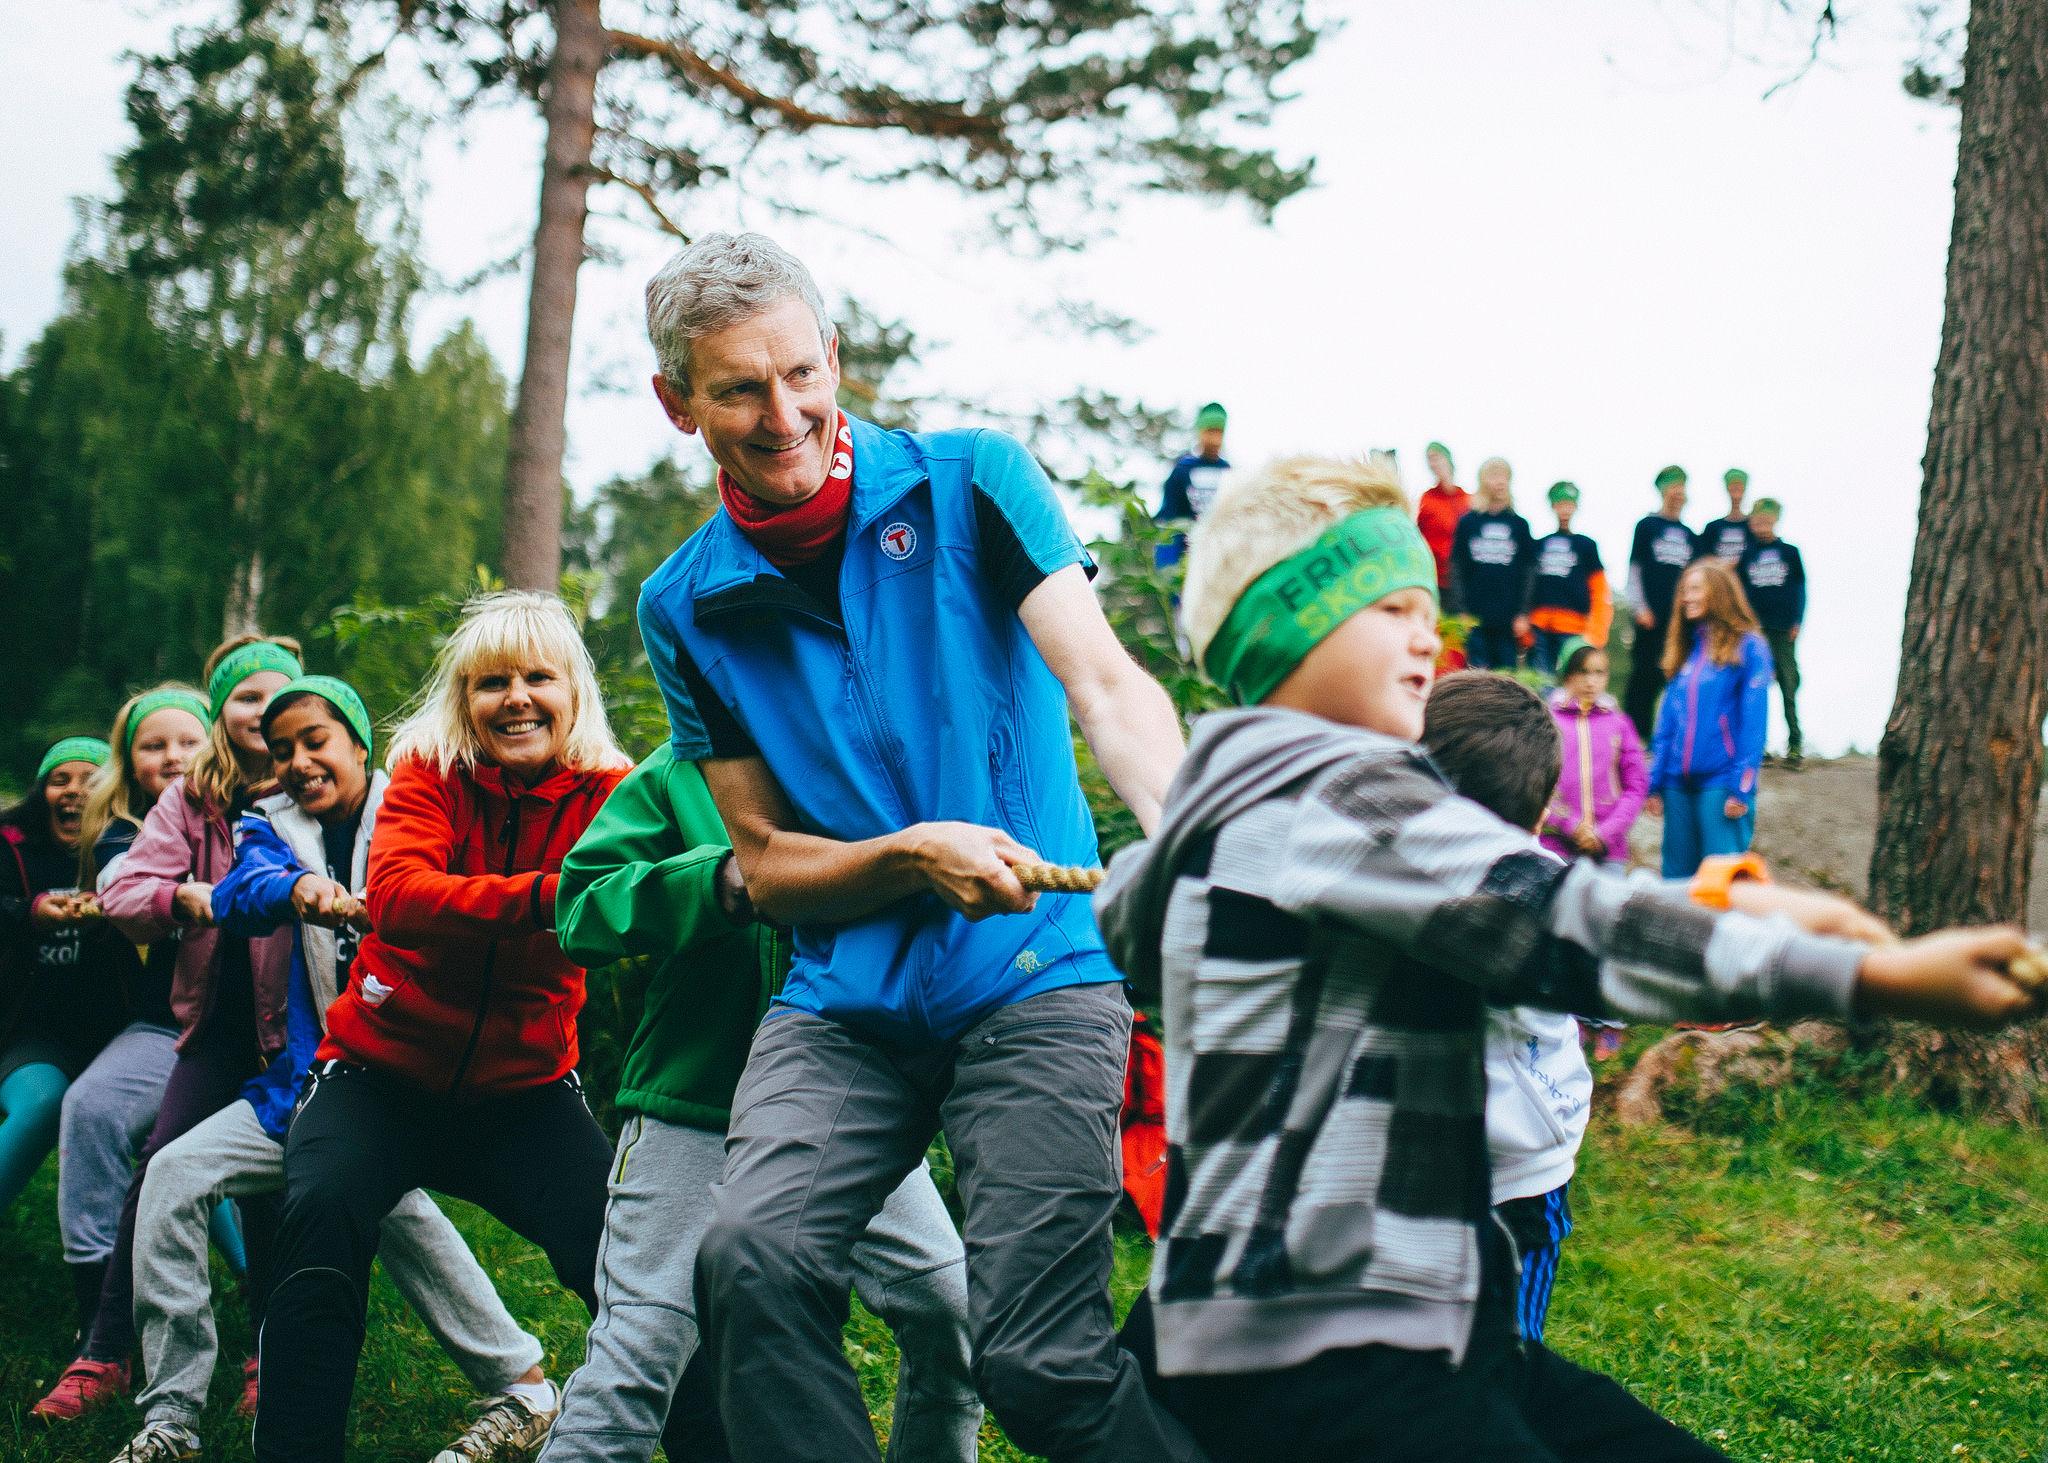 Nils Øveraas, generalsekretær i DNT, gir alt. Foto: Marius Dalseg Sætre/DNT